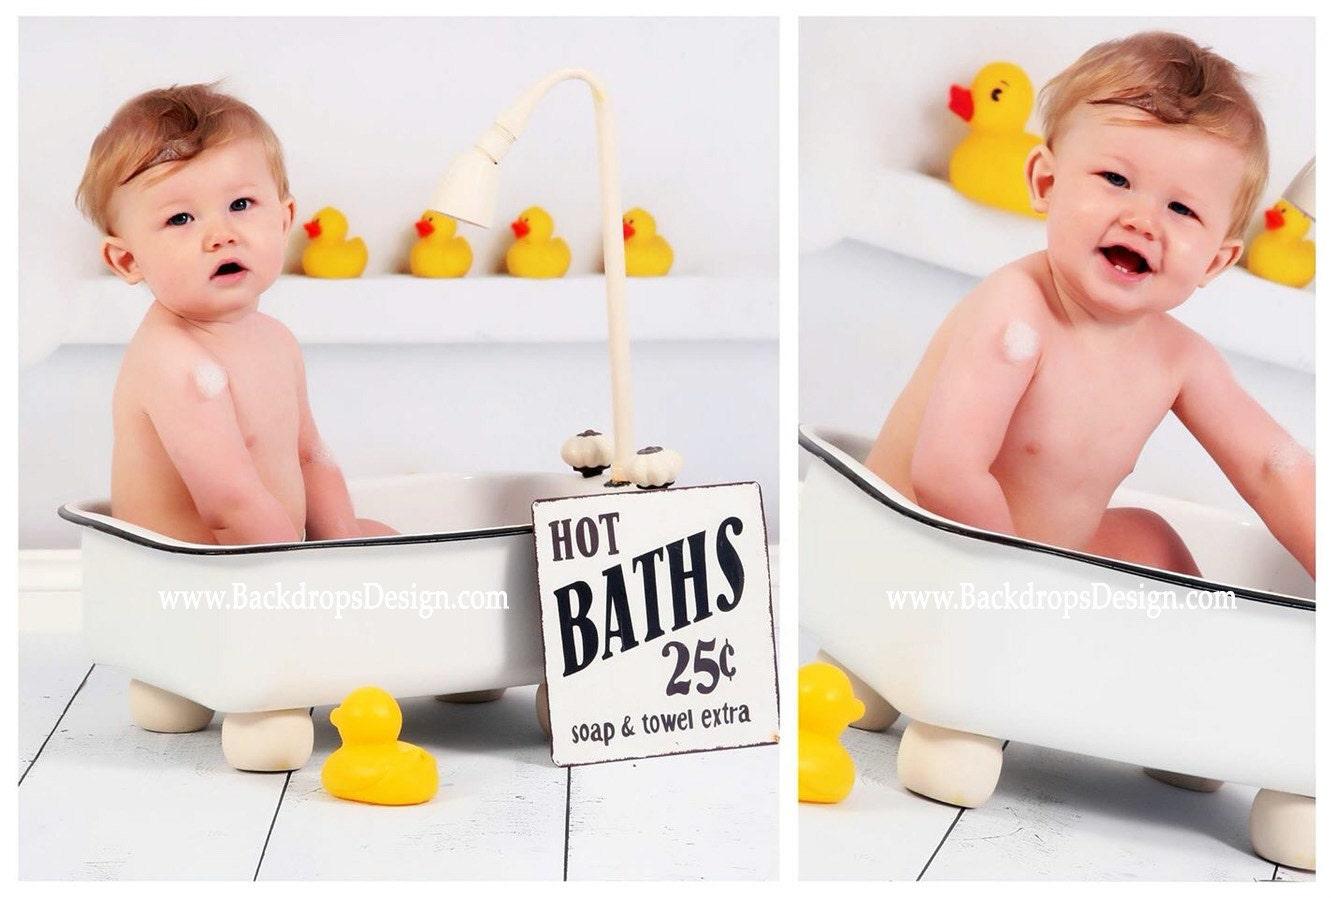 Wonderful Painting A Bathtub Big Paint For Bathtub Round Painting Bathtub Bath Refinishing Service Old Paint A Bathtub Gray Can I Paint My Bathtub